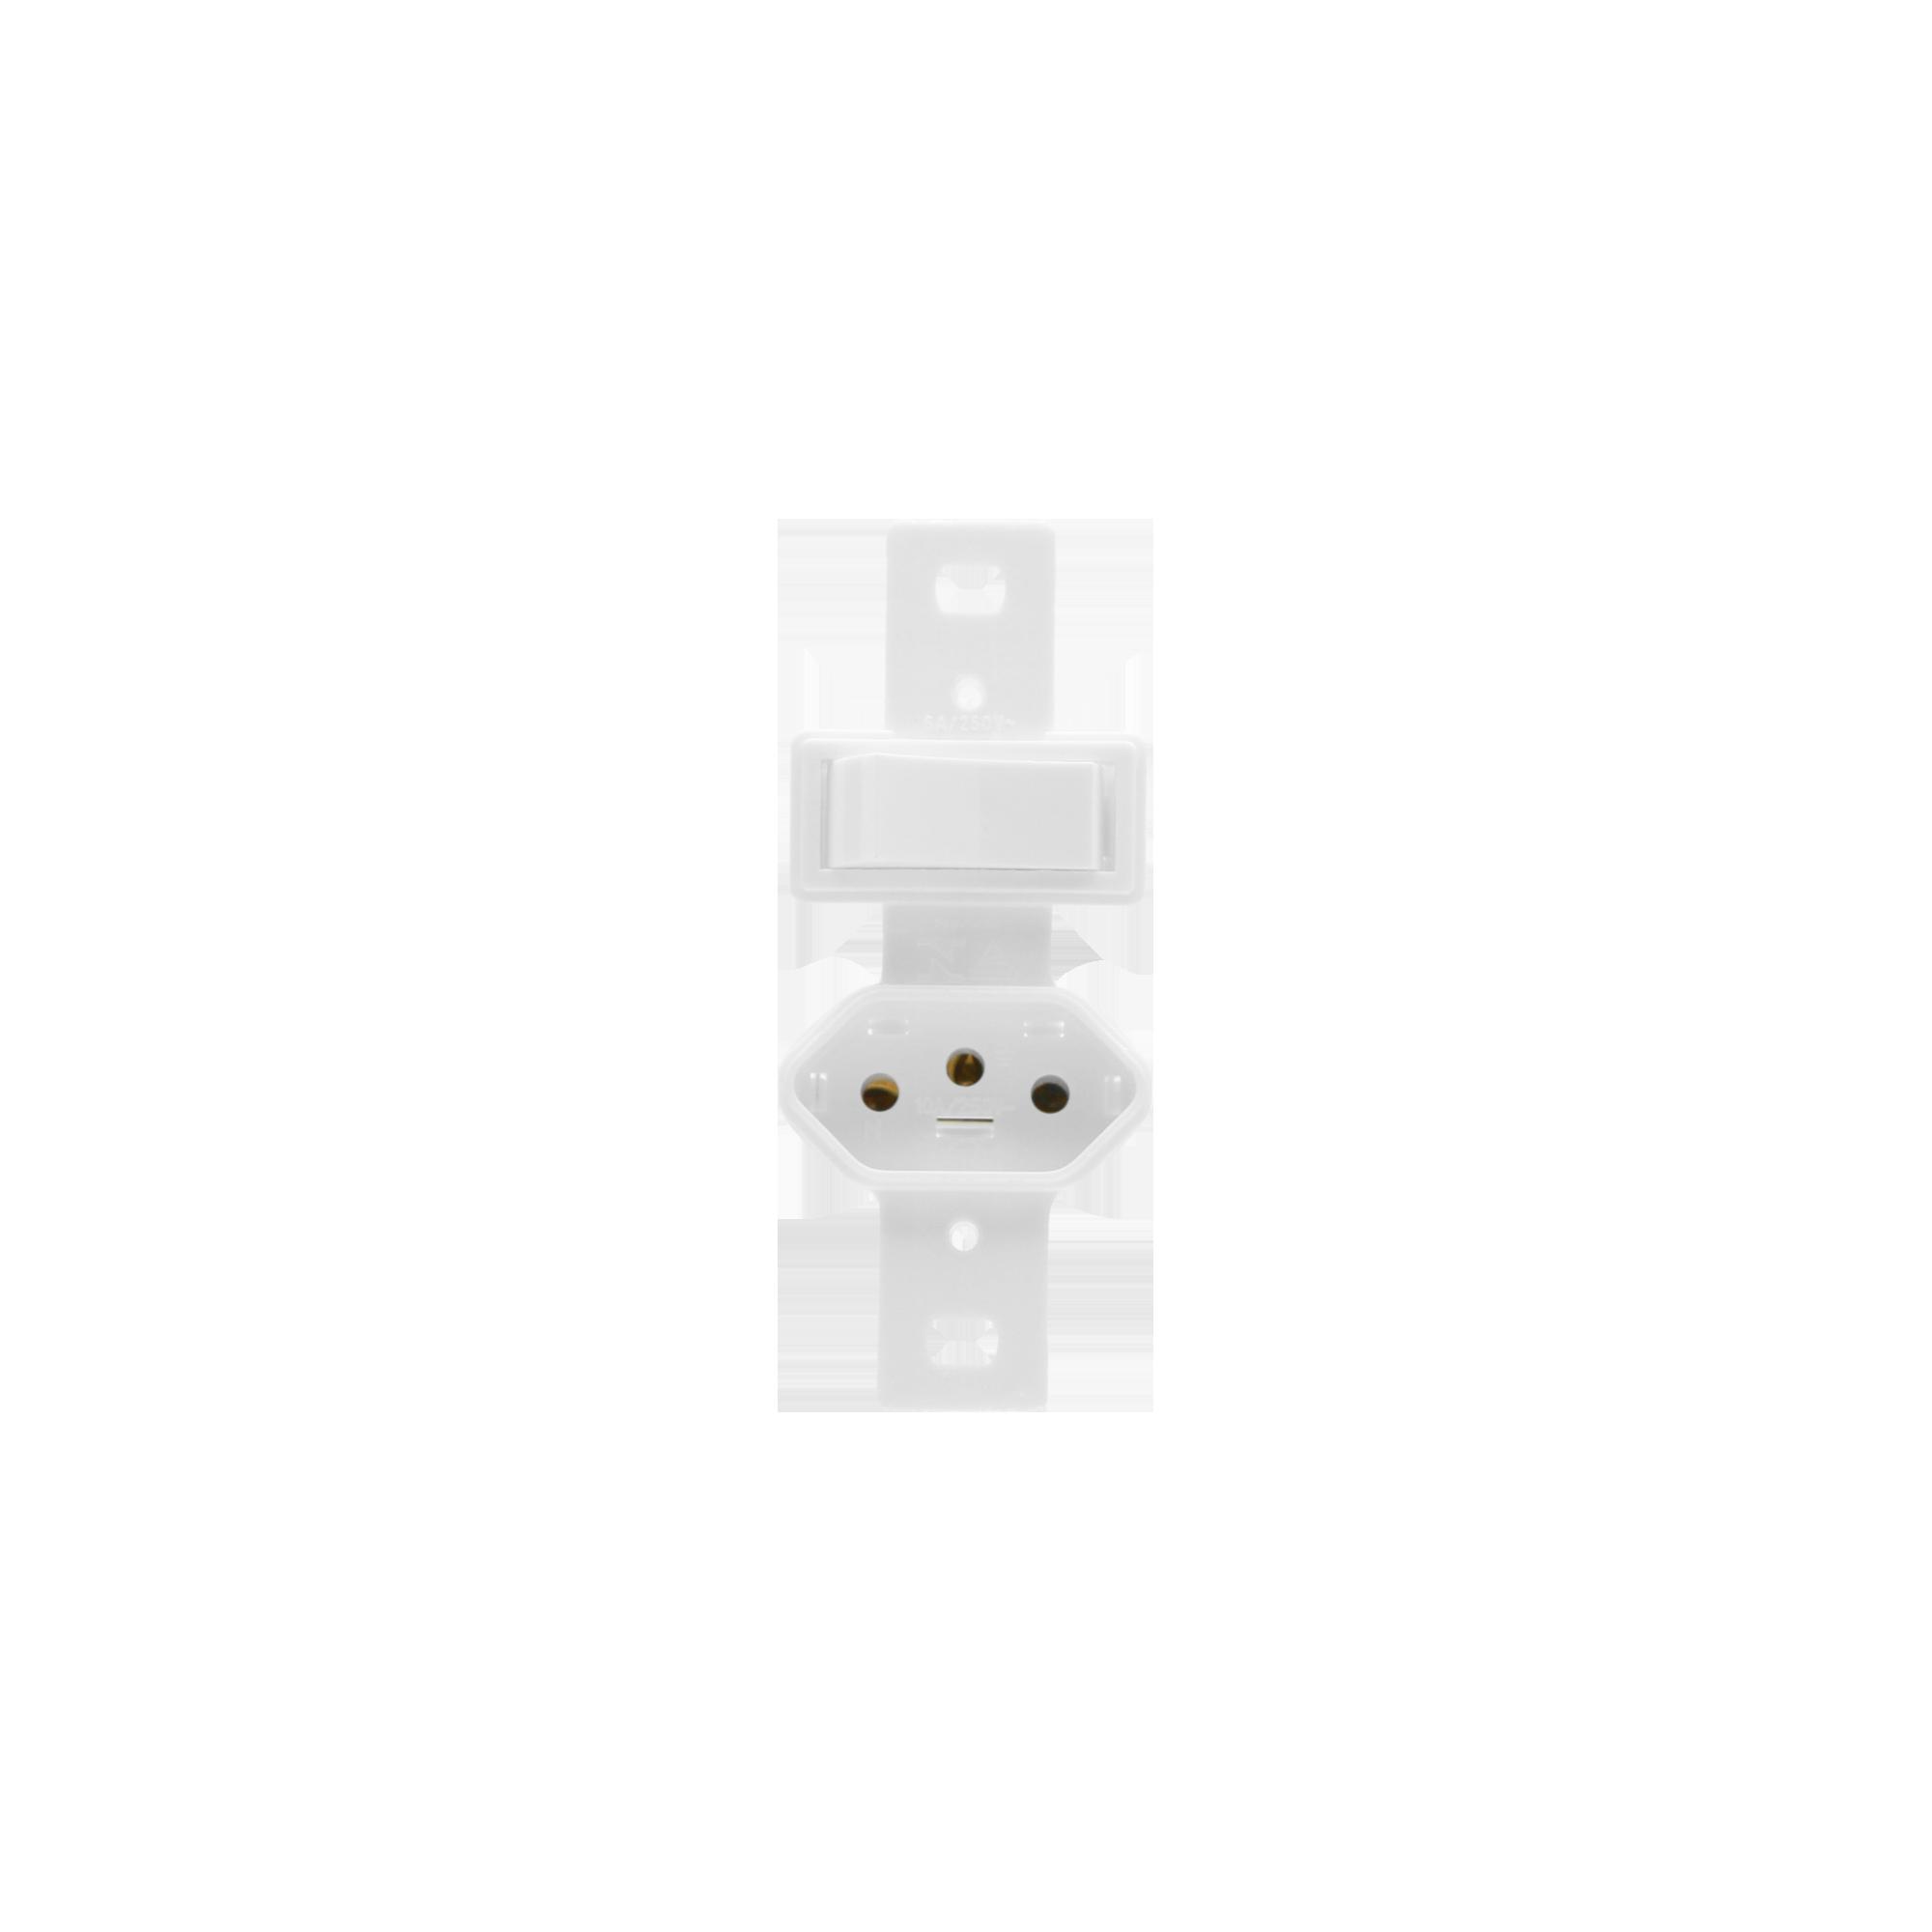 Conjunto Stylus 1 Interruptor Paralelo + Tomada 2P+T 20280 Ilumi